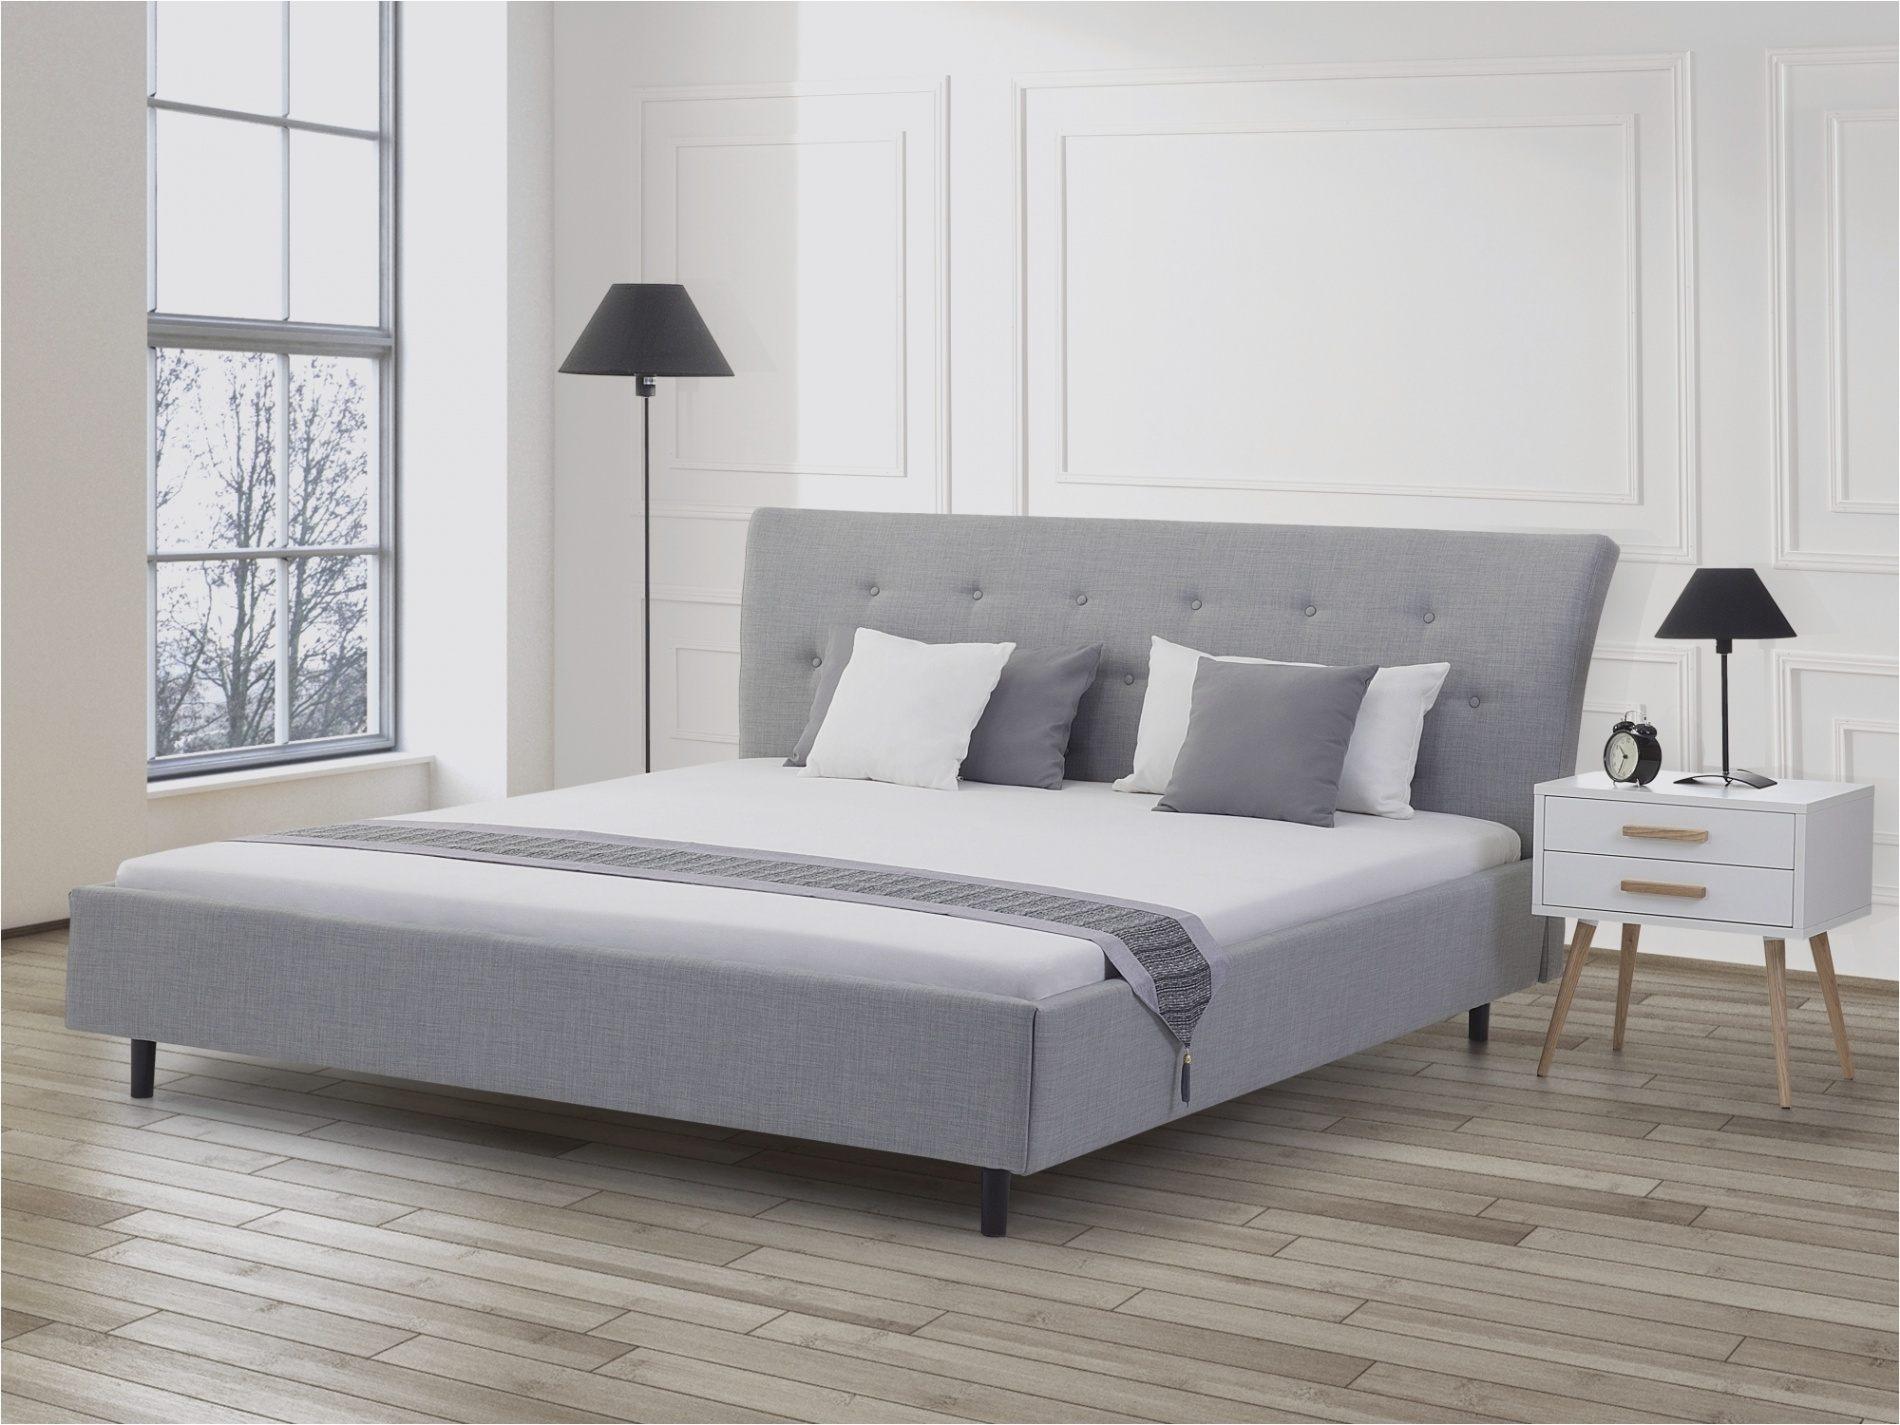 Lit Design 160x200 160x200 Finest Lit X Led Lit Led Design Groupon